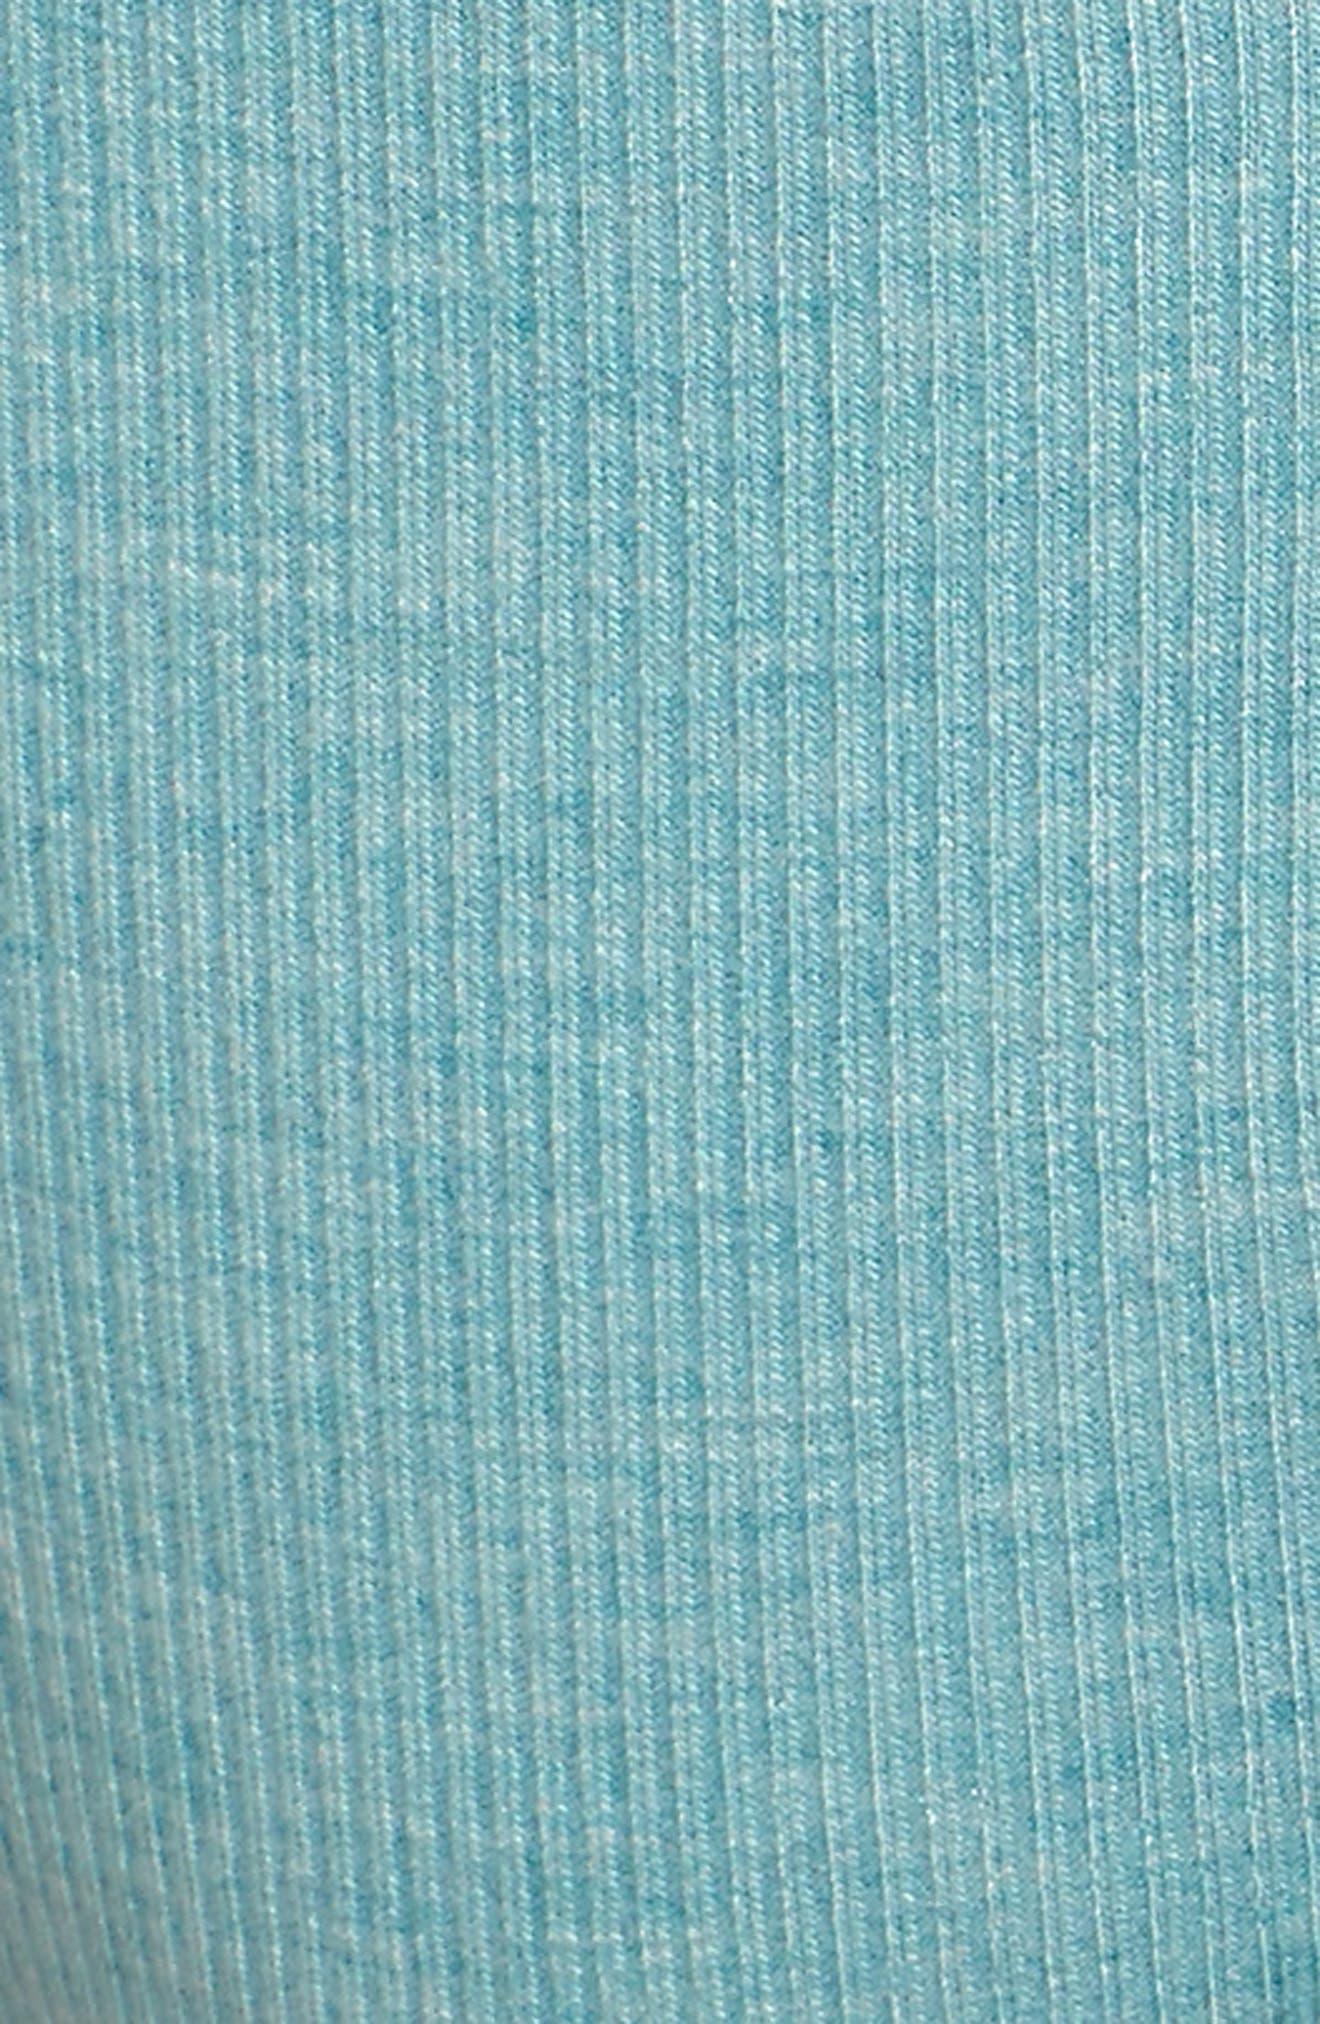 Rib Knit Bikini,                             Alternate thumbnail 5, color,                             Prickly Pear